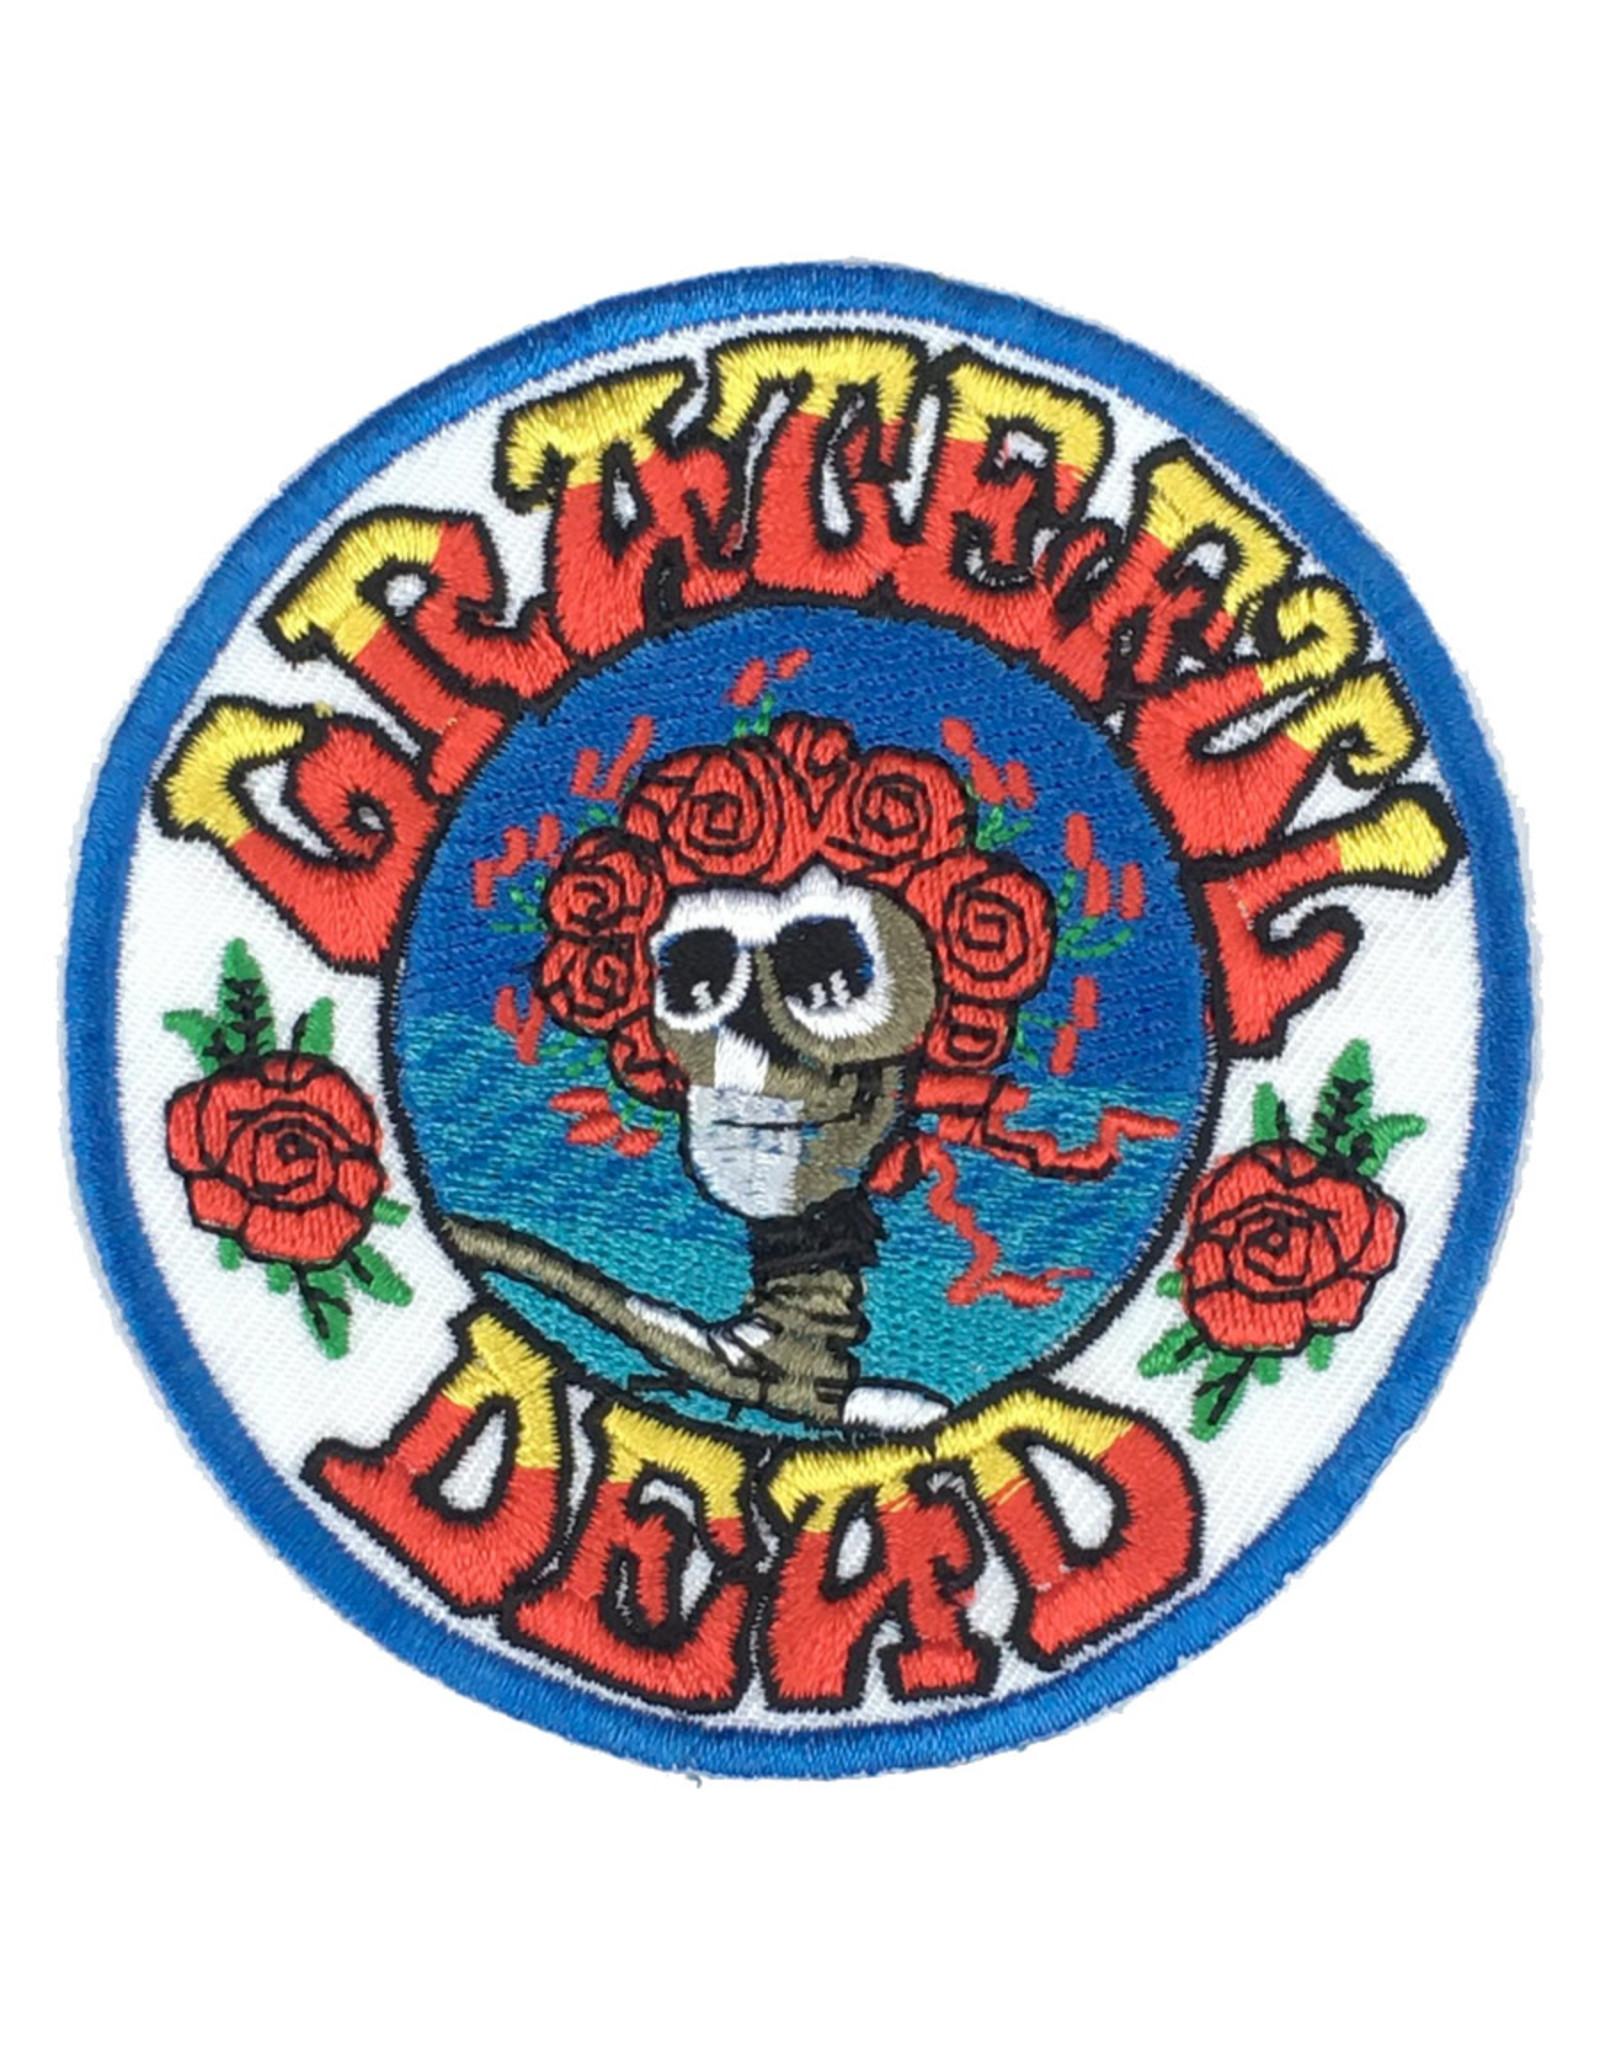 Star 500 Concert Series On Hollywood Patch Grateful Dead Skull Rose